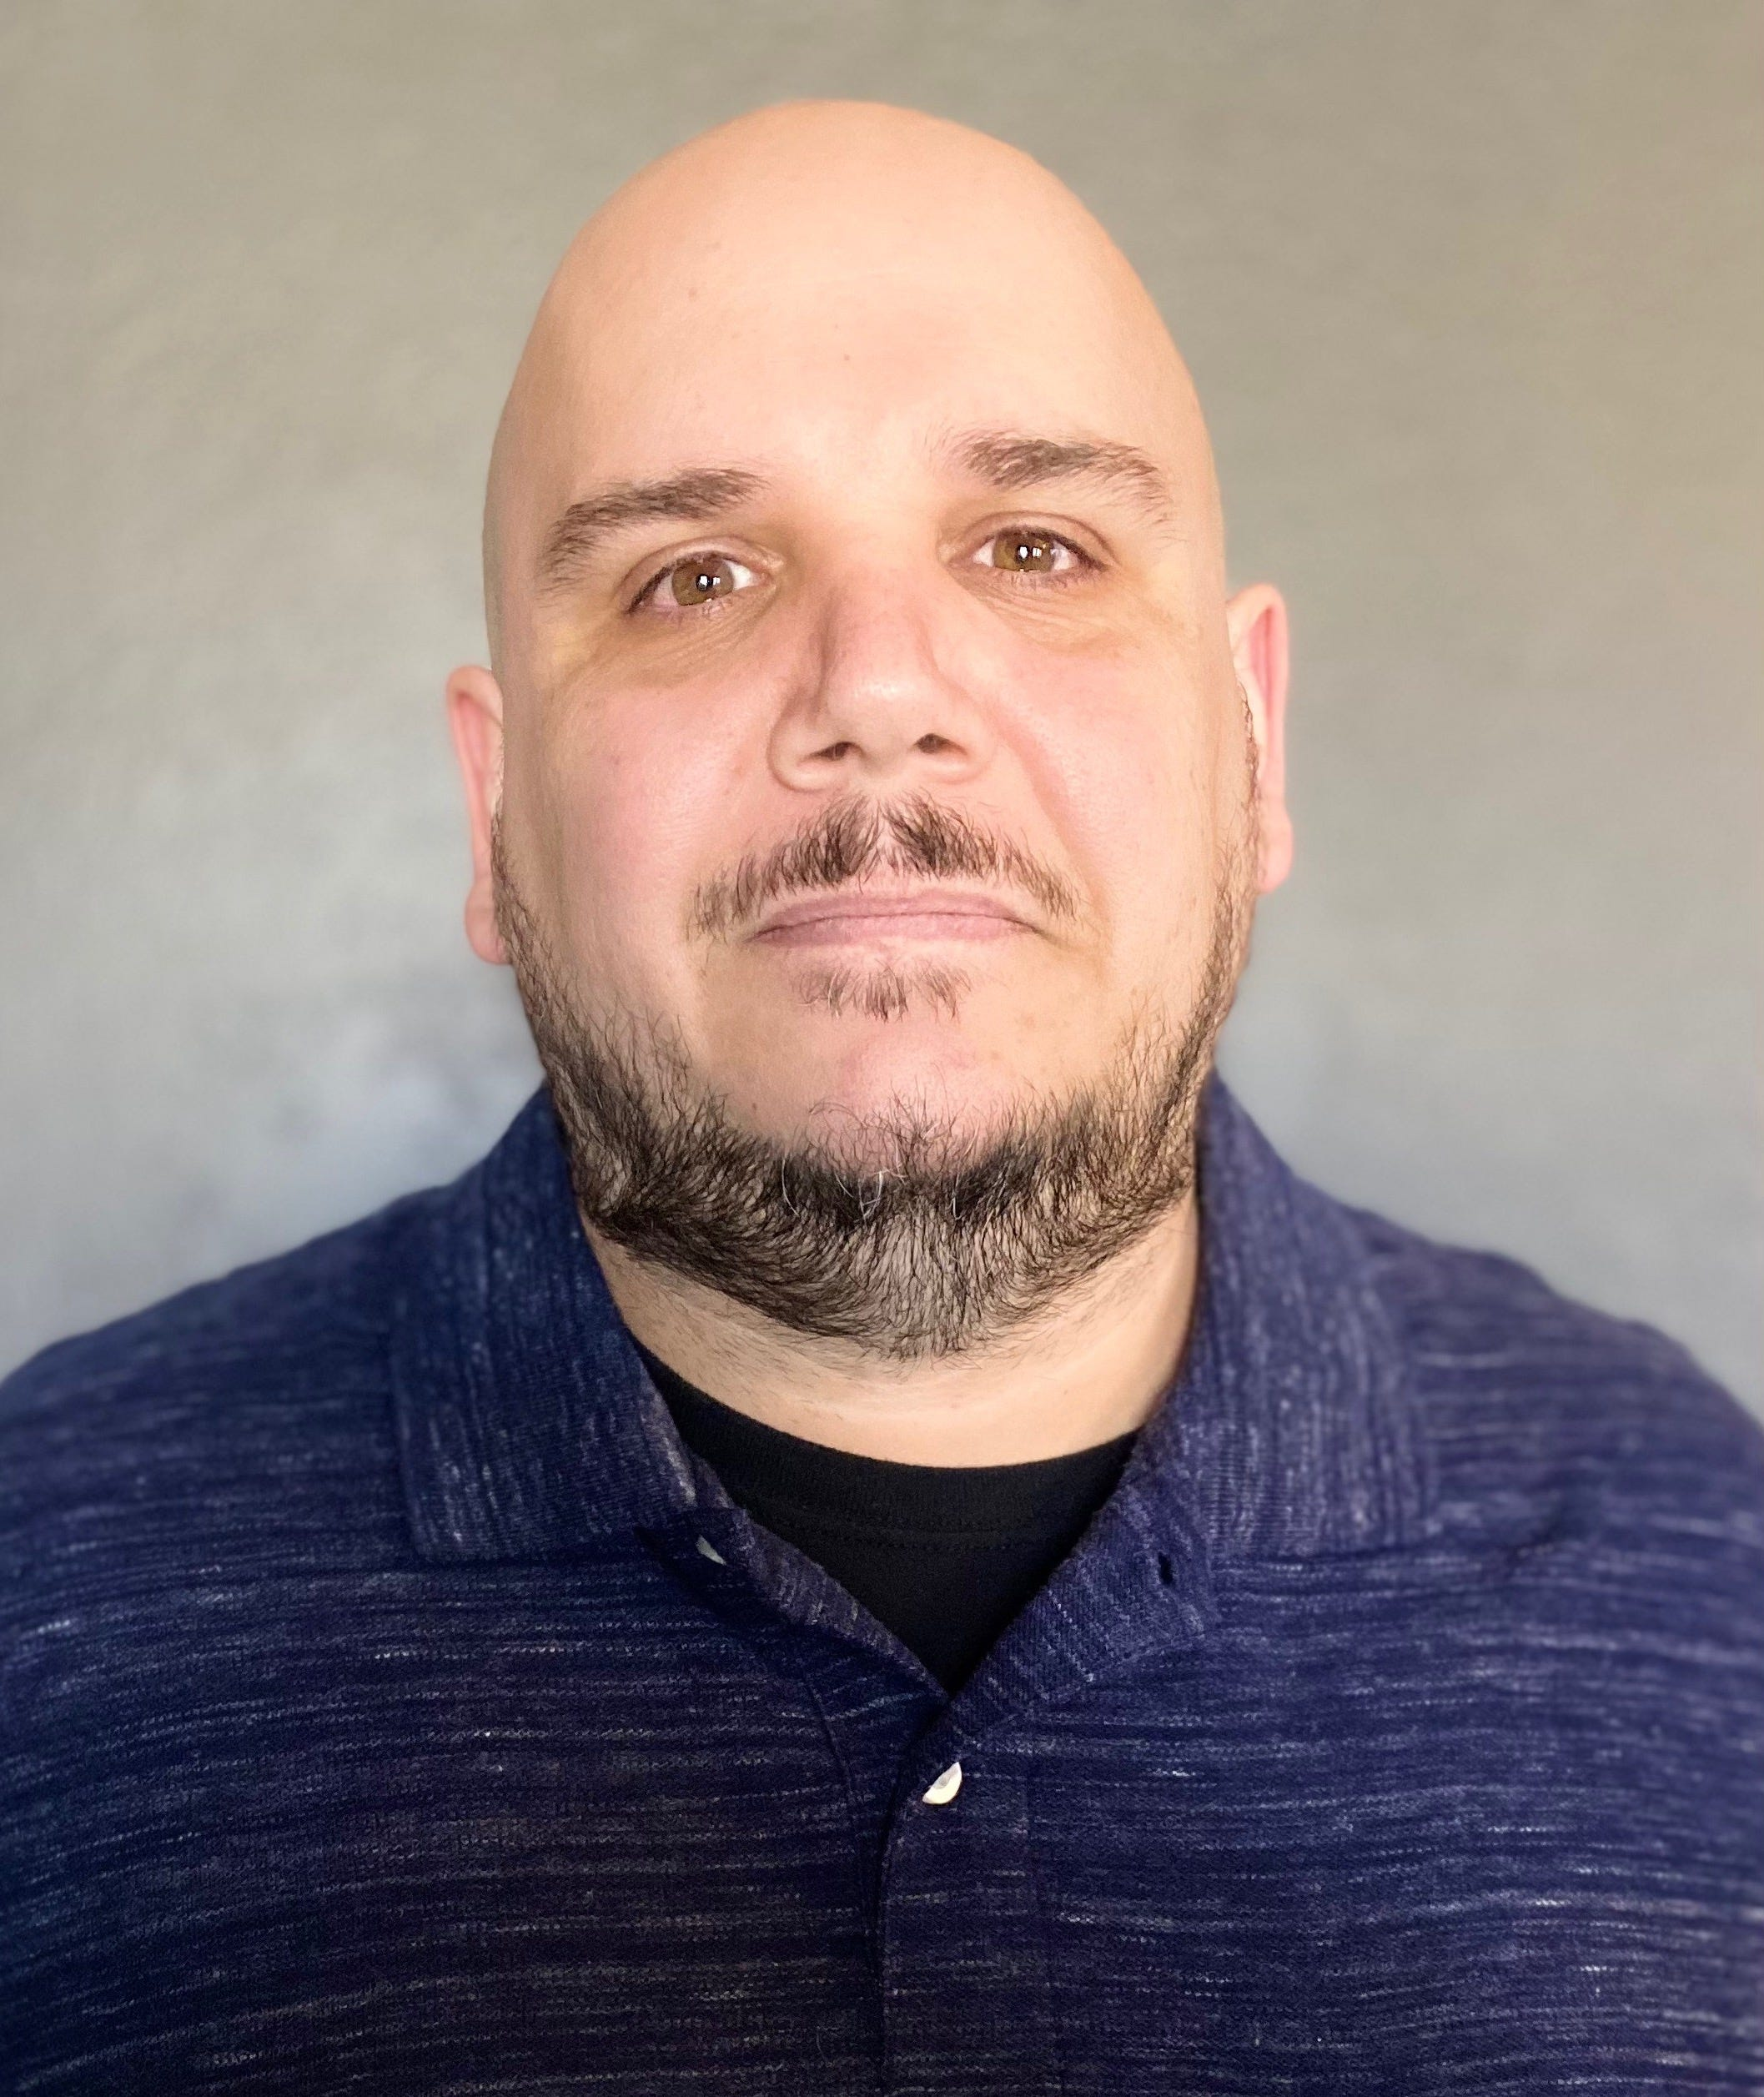 Jason Contreras, 40, of Ventura, works as a housekeeper at Ventura County Medical Center.